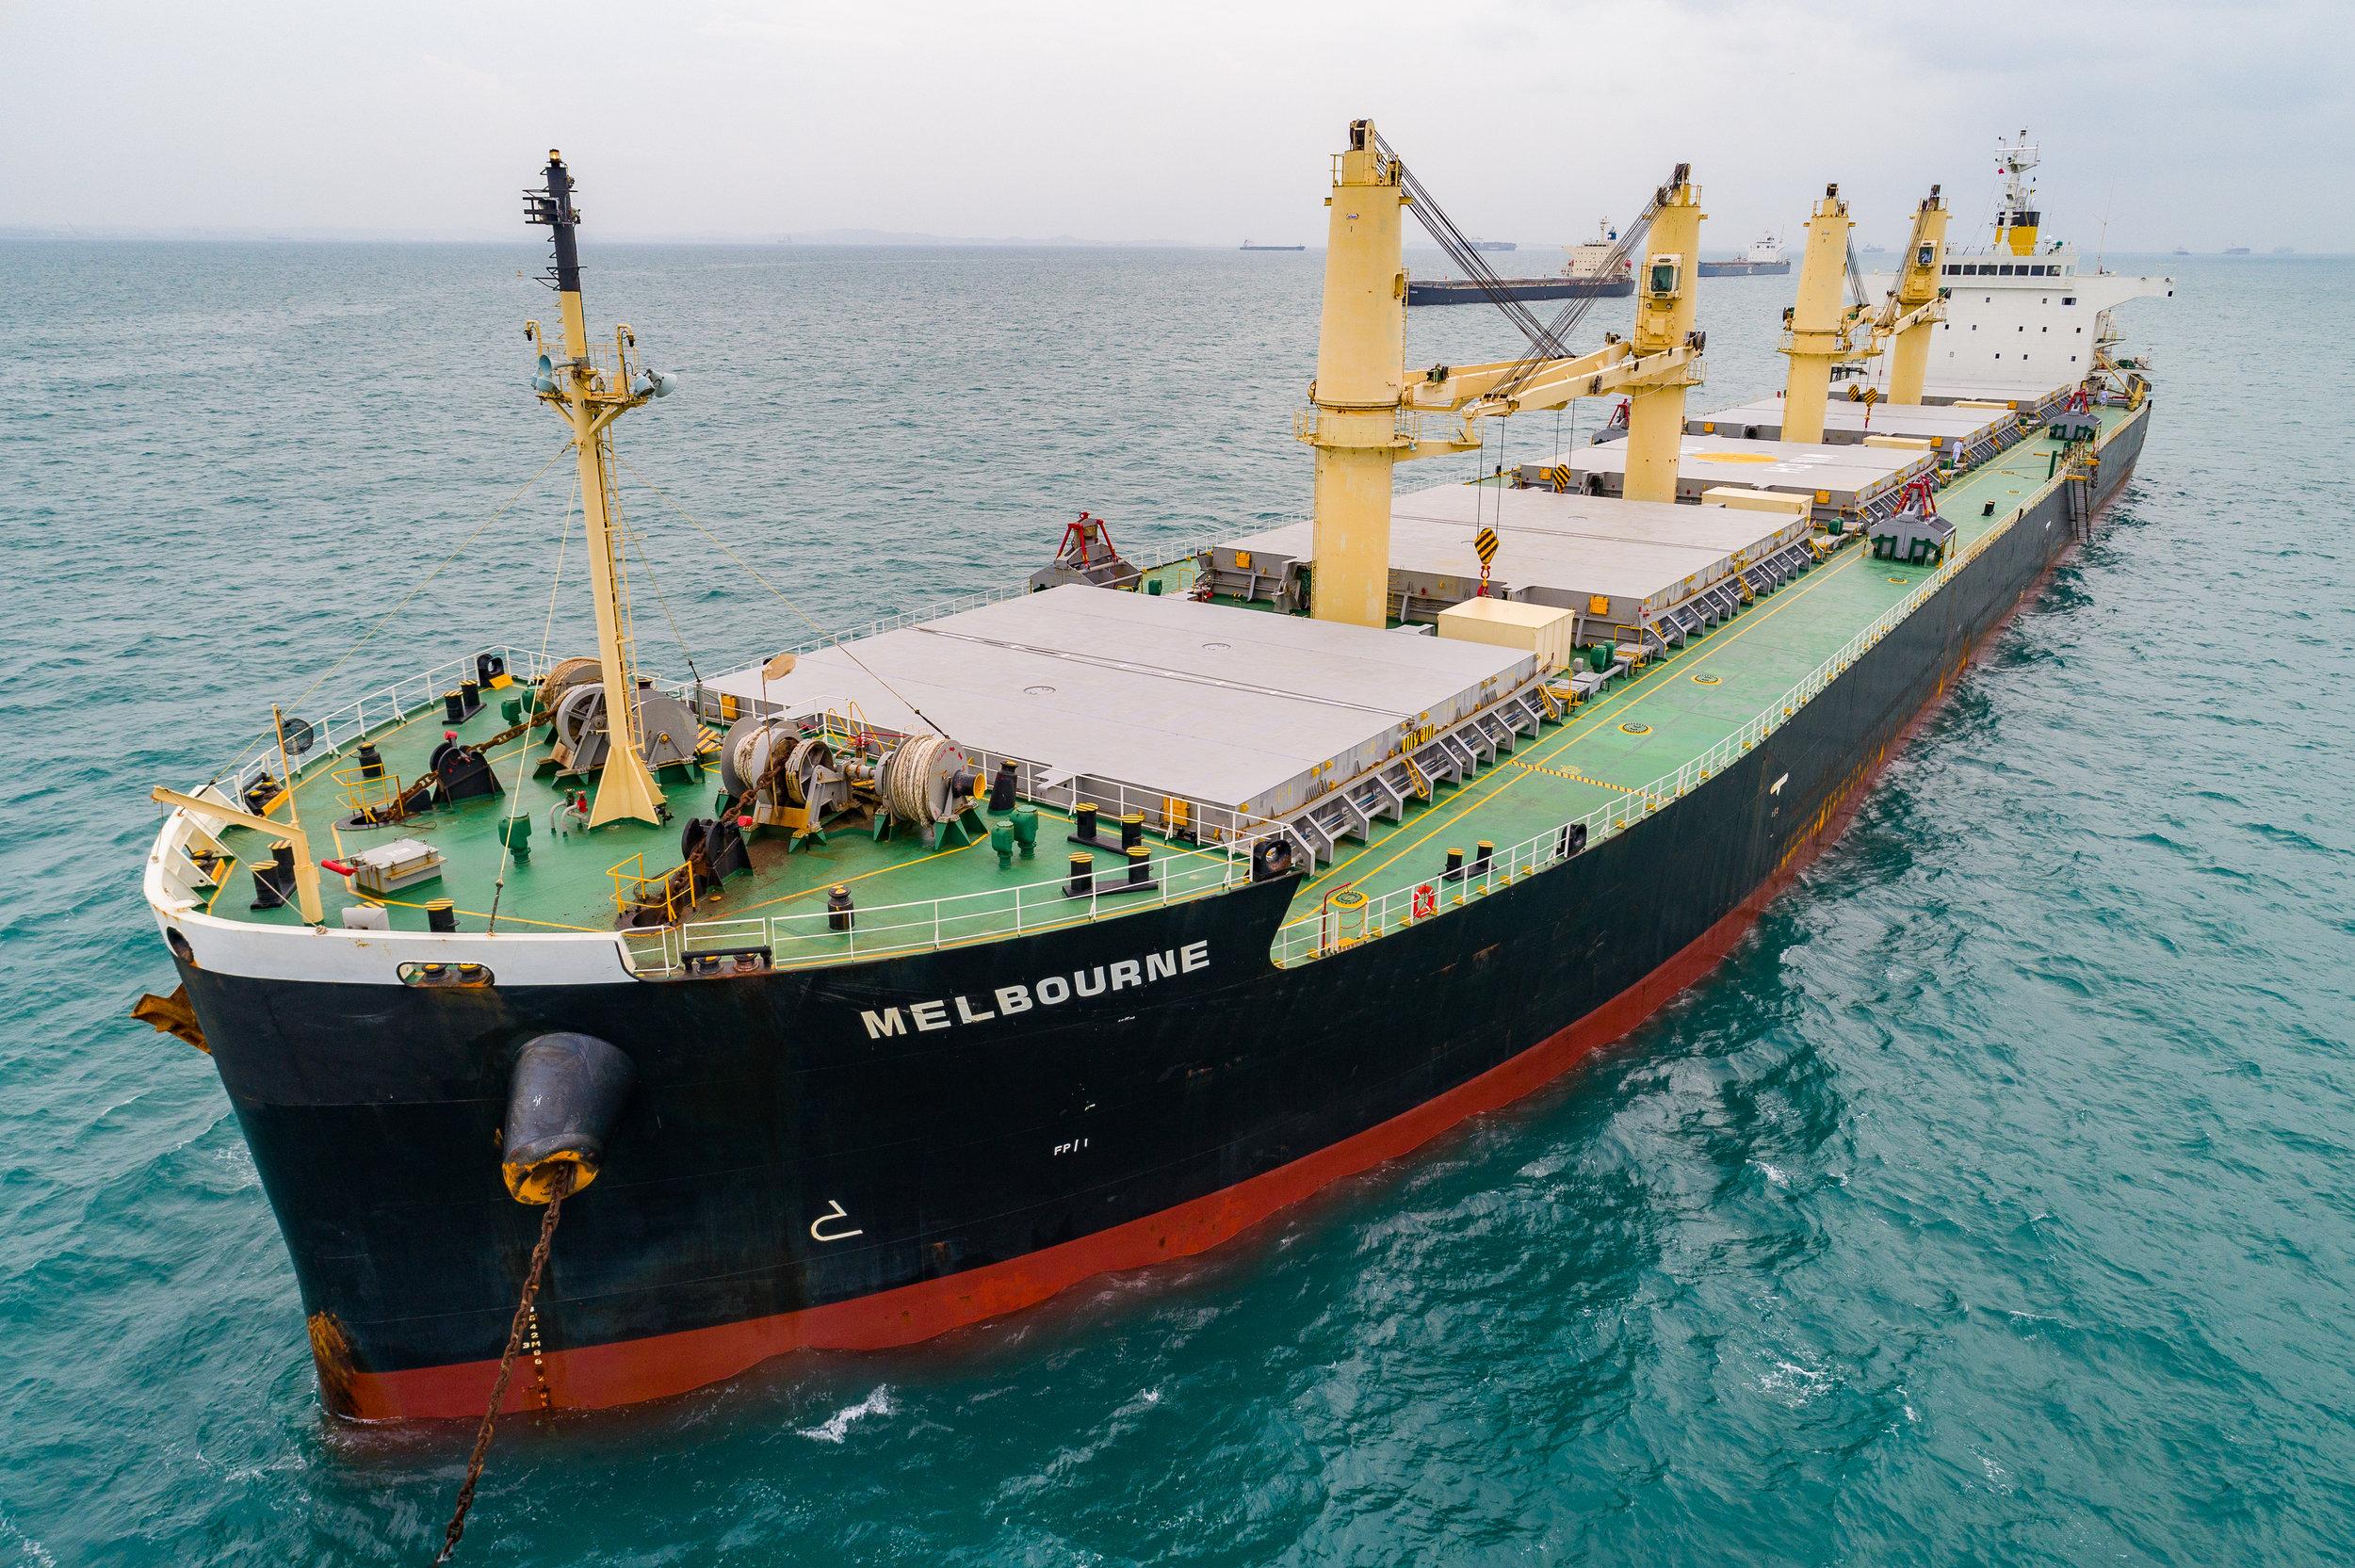 Ship Melbourne_11.JPG